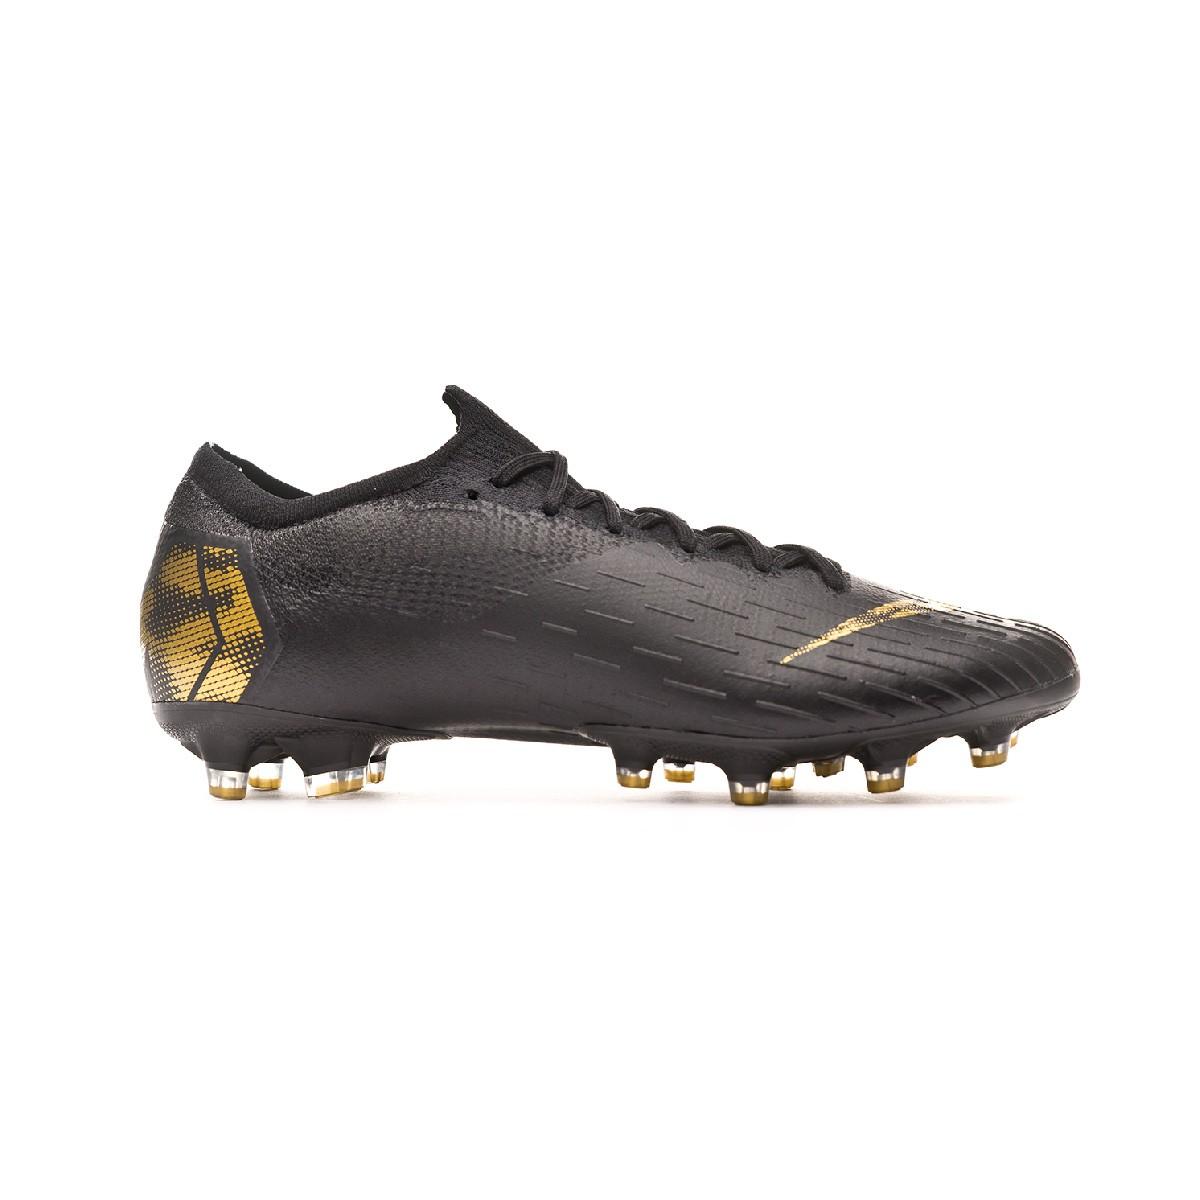 5e310351c81aa Football Boots Nike Mercurial Vapor XII Elite AG-Pro Black-Metallic vivid  gold - Tienda de fútbol Fútbol Emotion